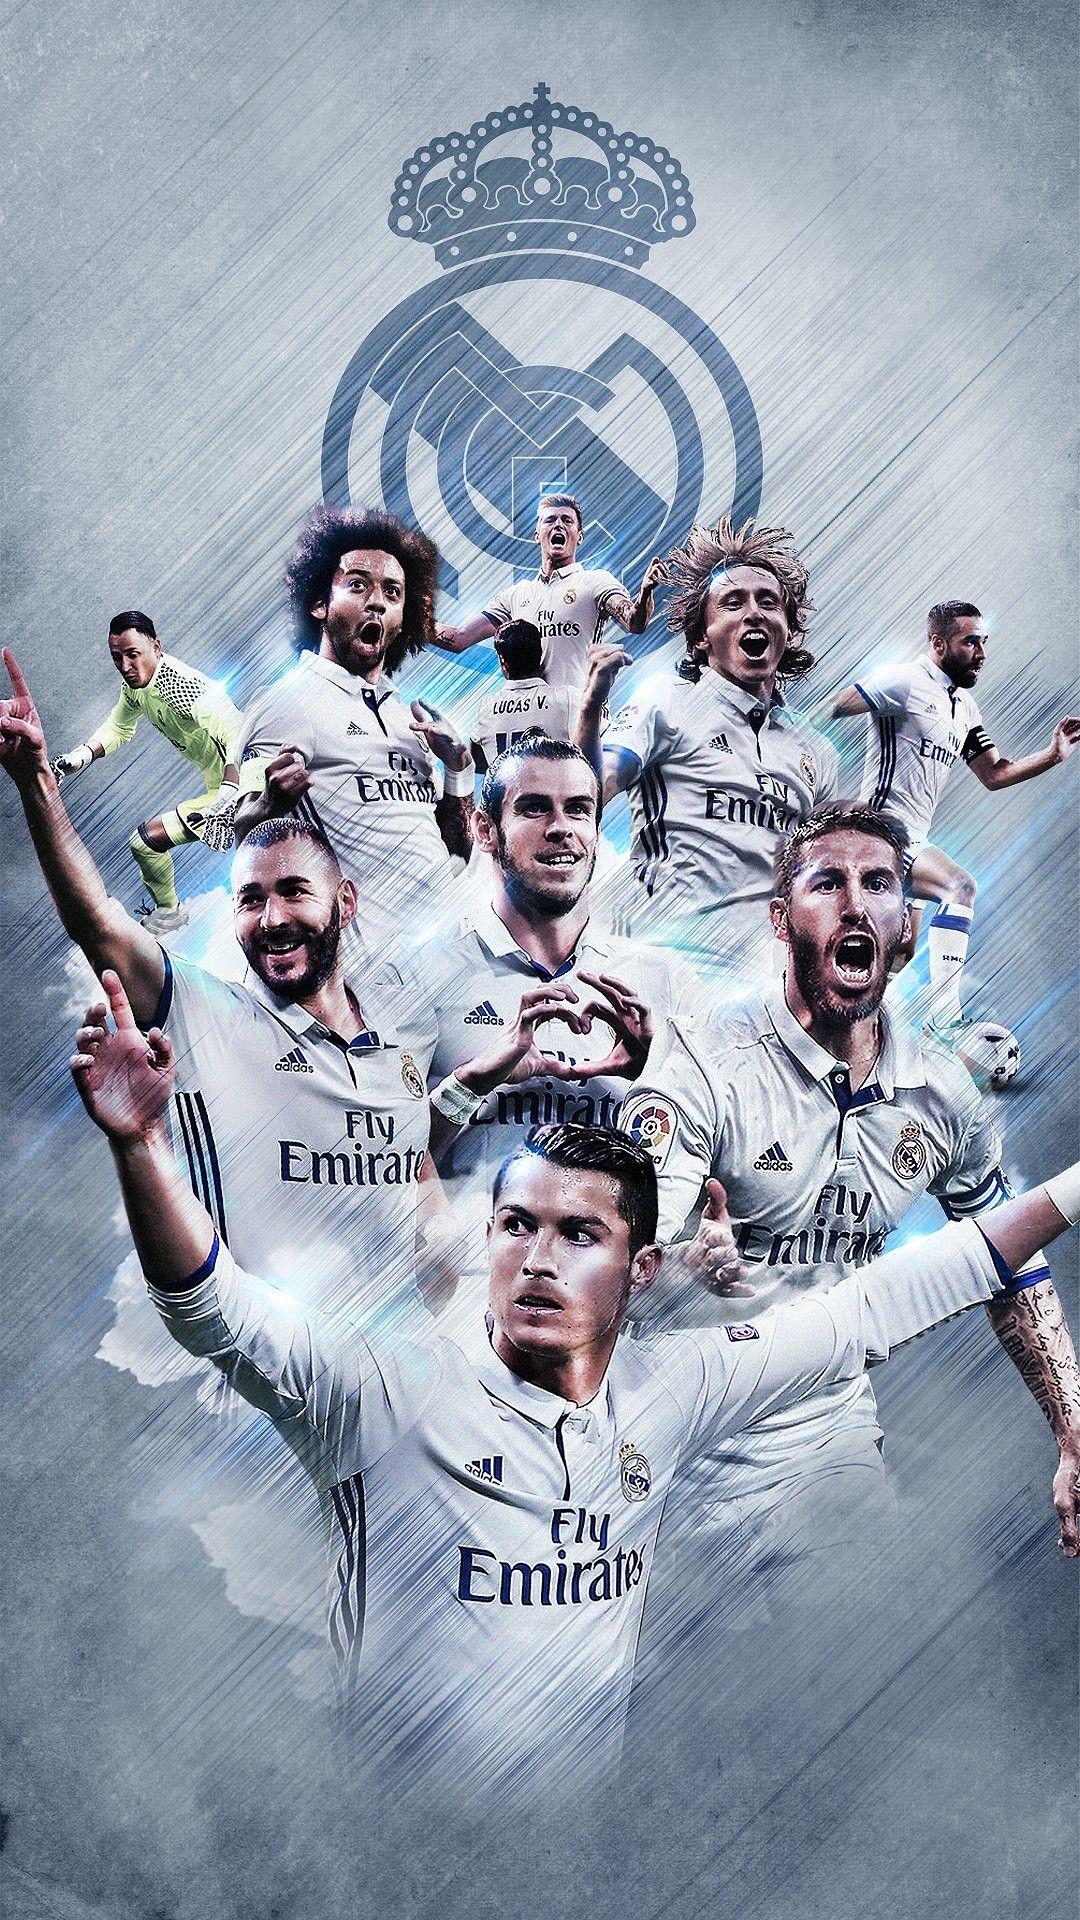 1080x1920 Real Madrid Real Madrid Wallpapers Real Madrid Football Madrid Wallpaper